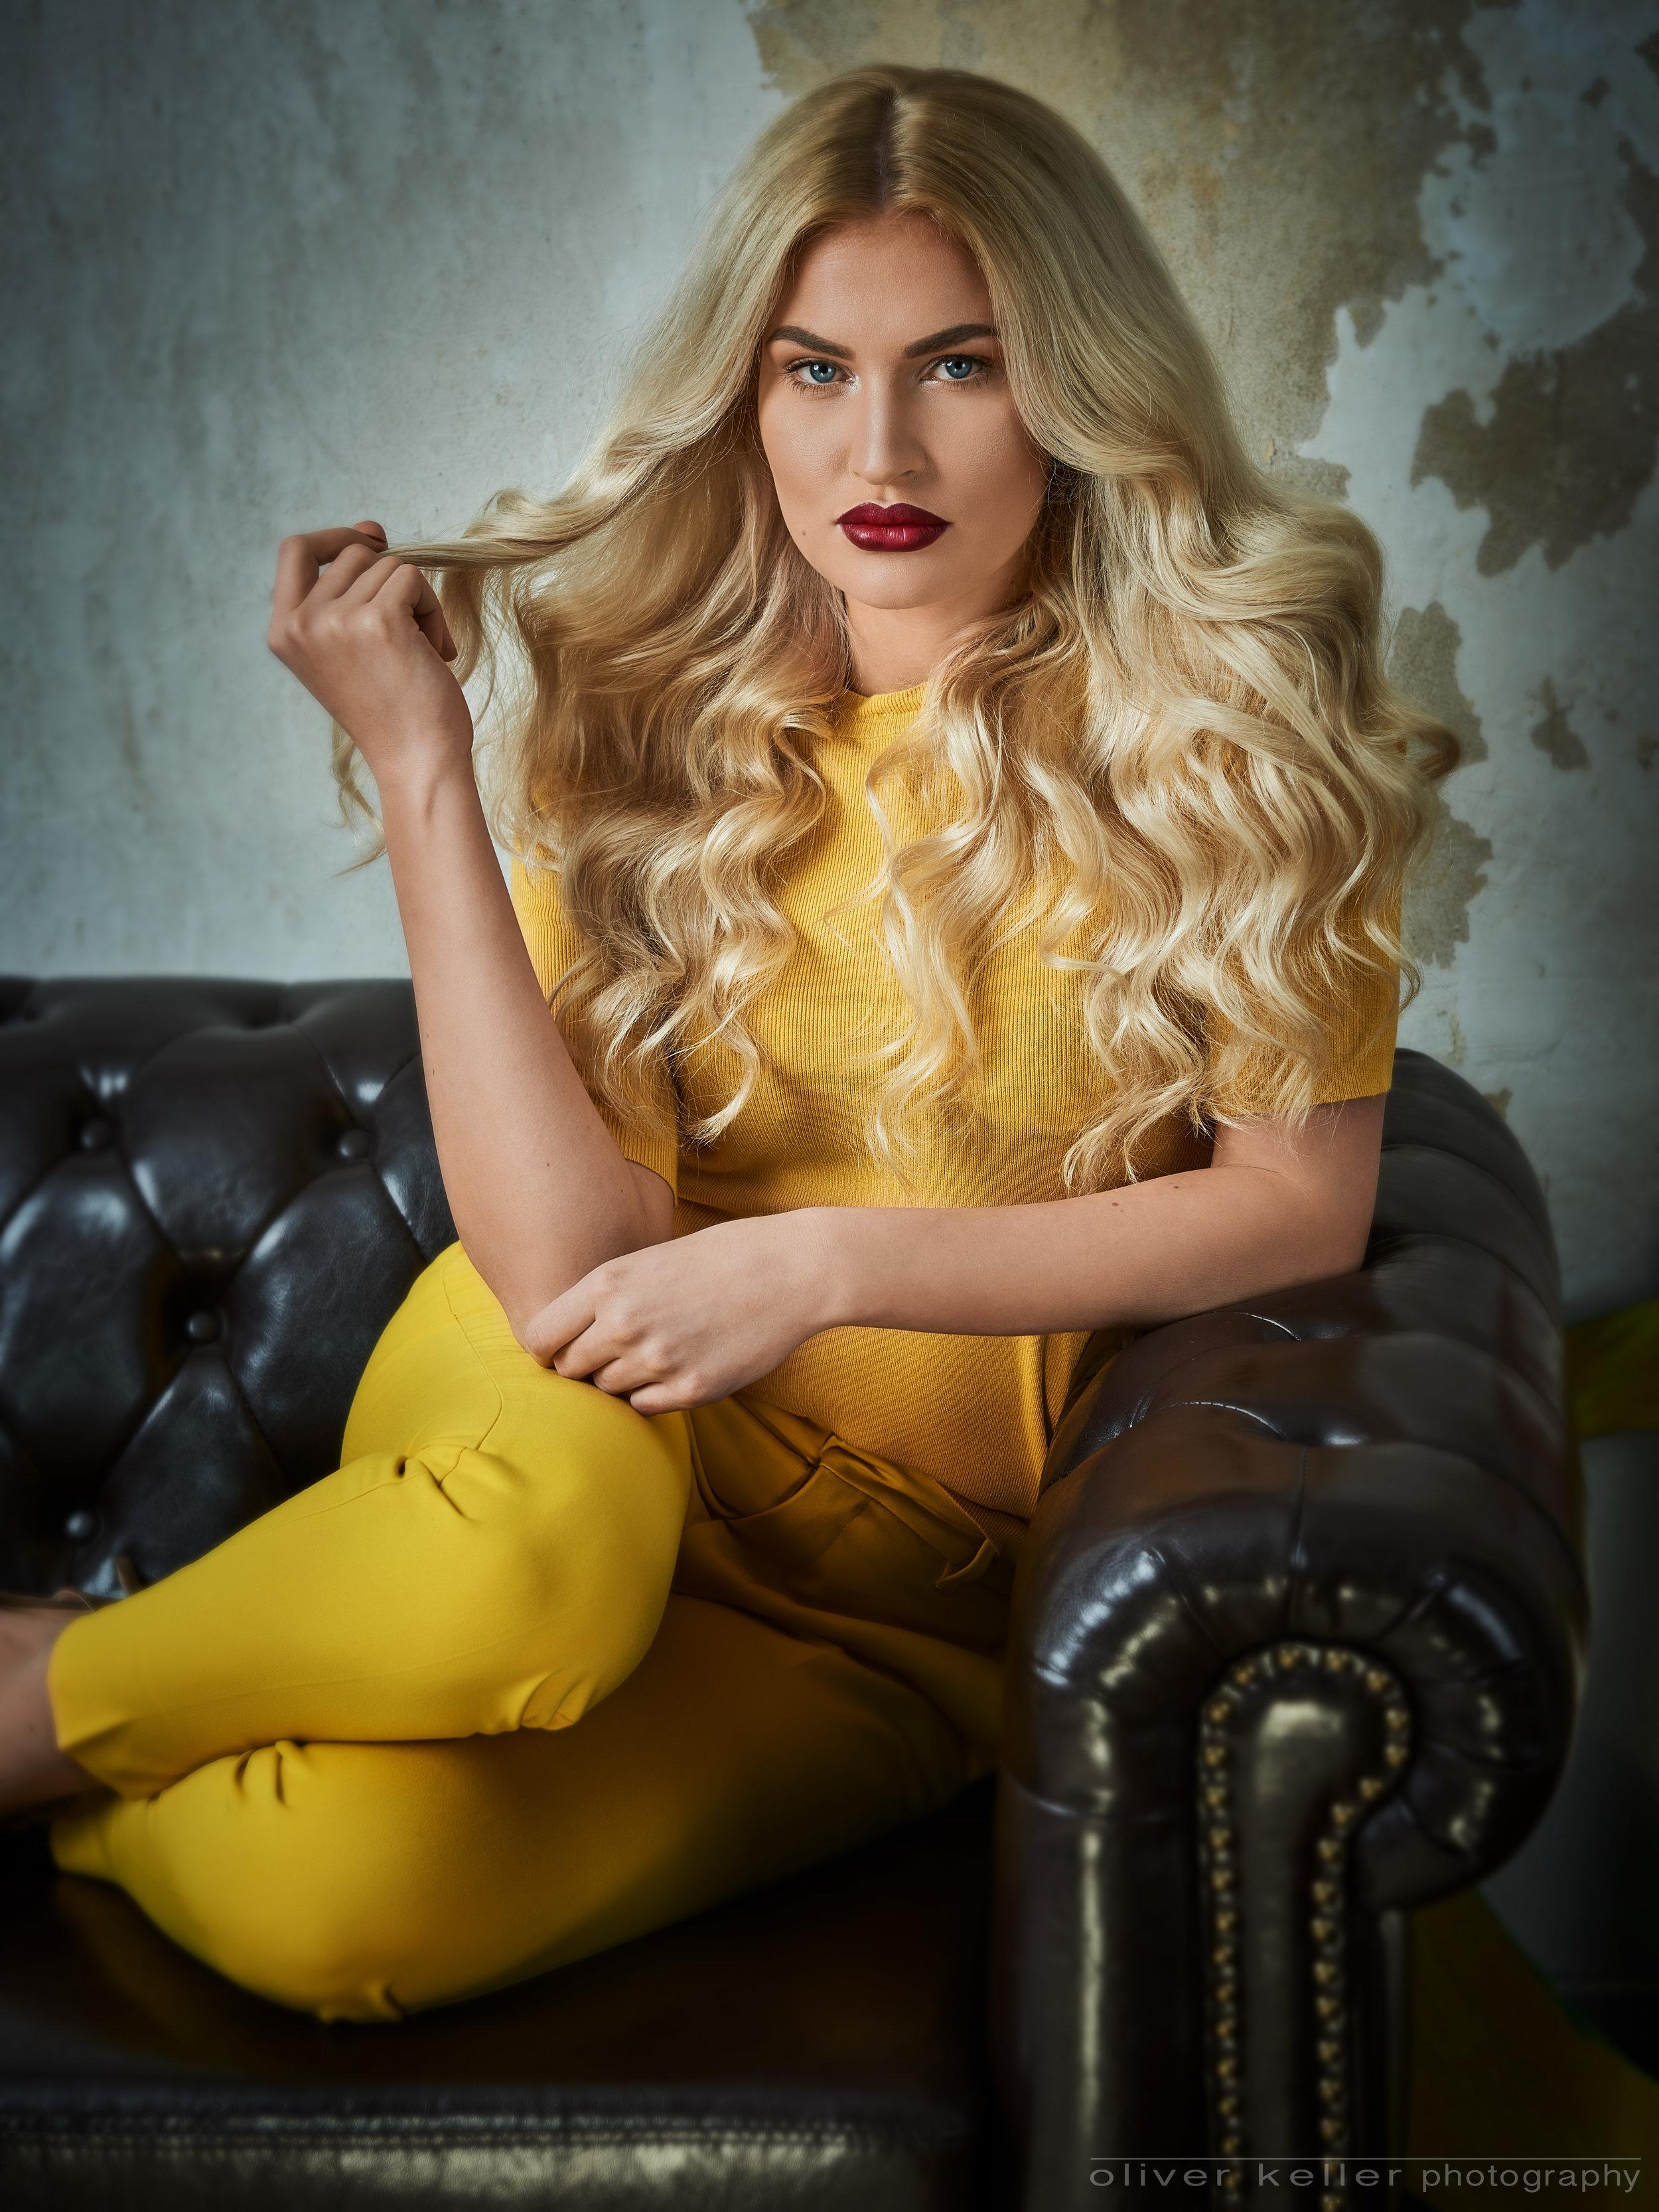 2016-11-11-yellow-fashion16316.jpg